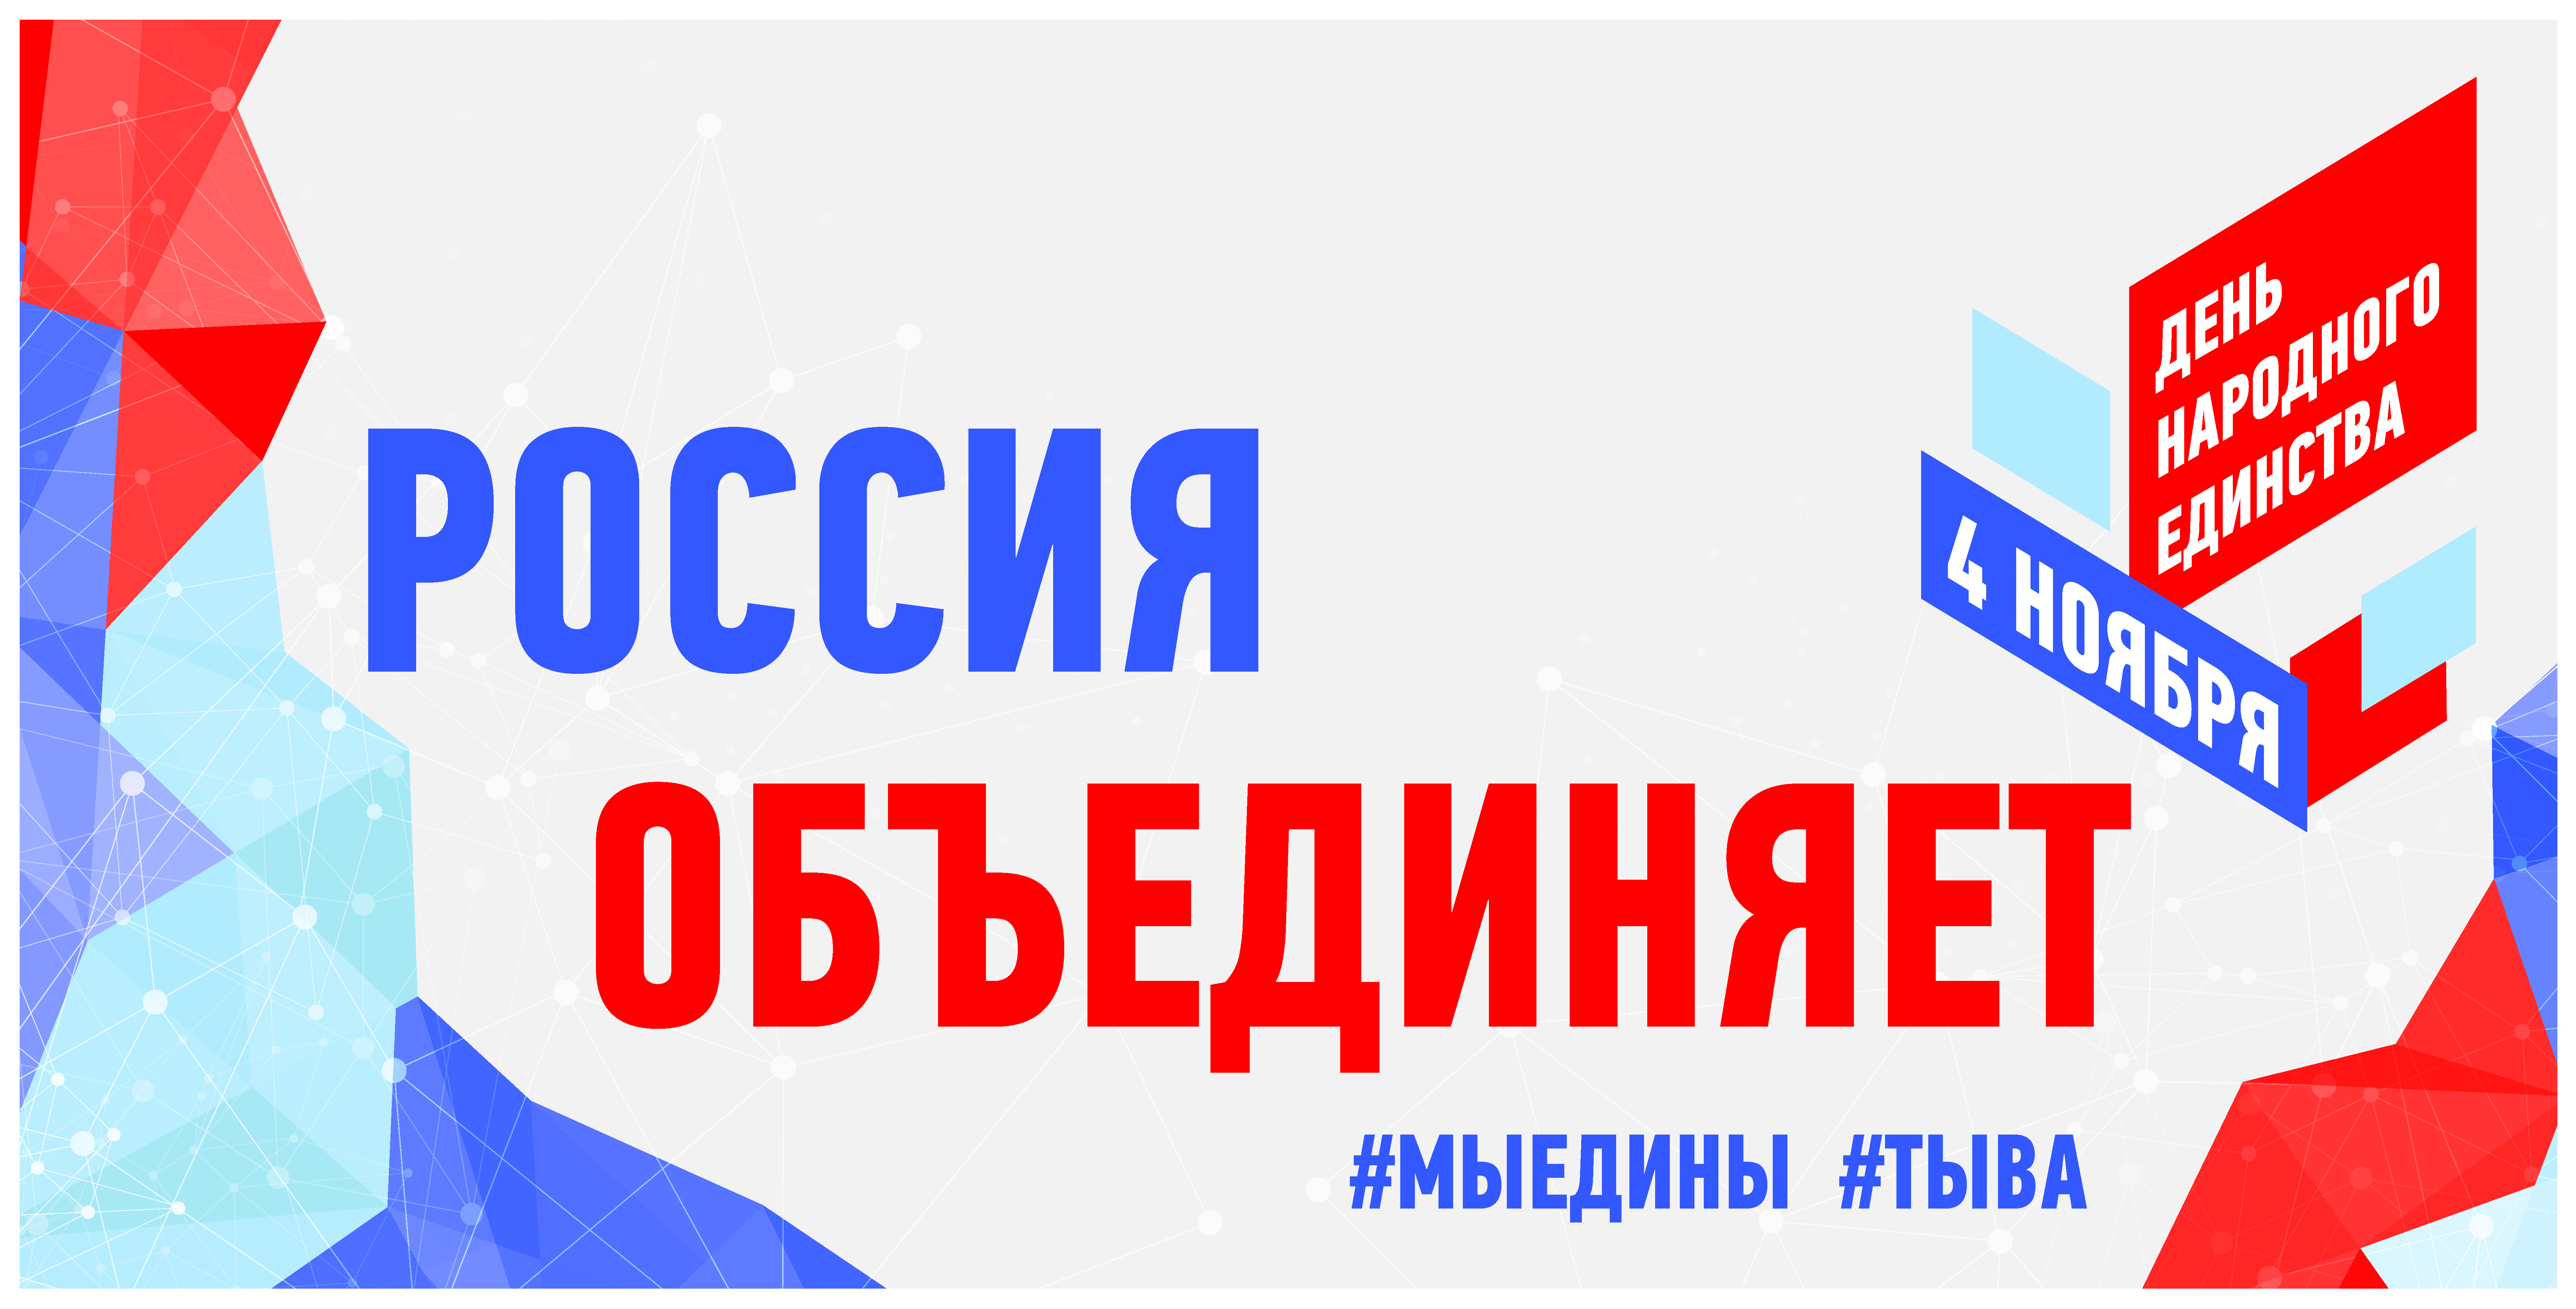 Одноклассники - Вход без пароля и логина